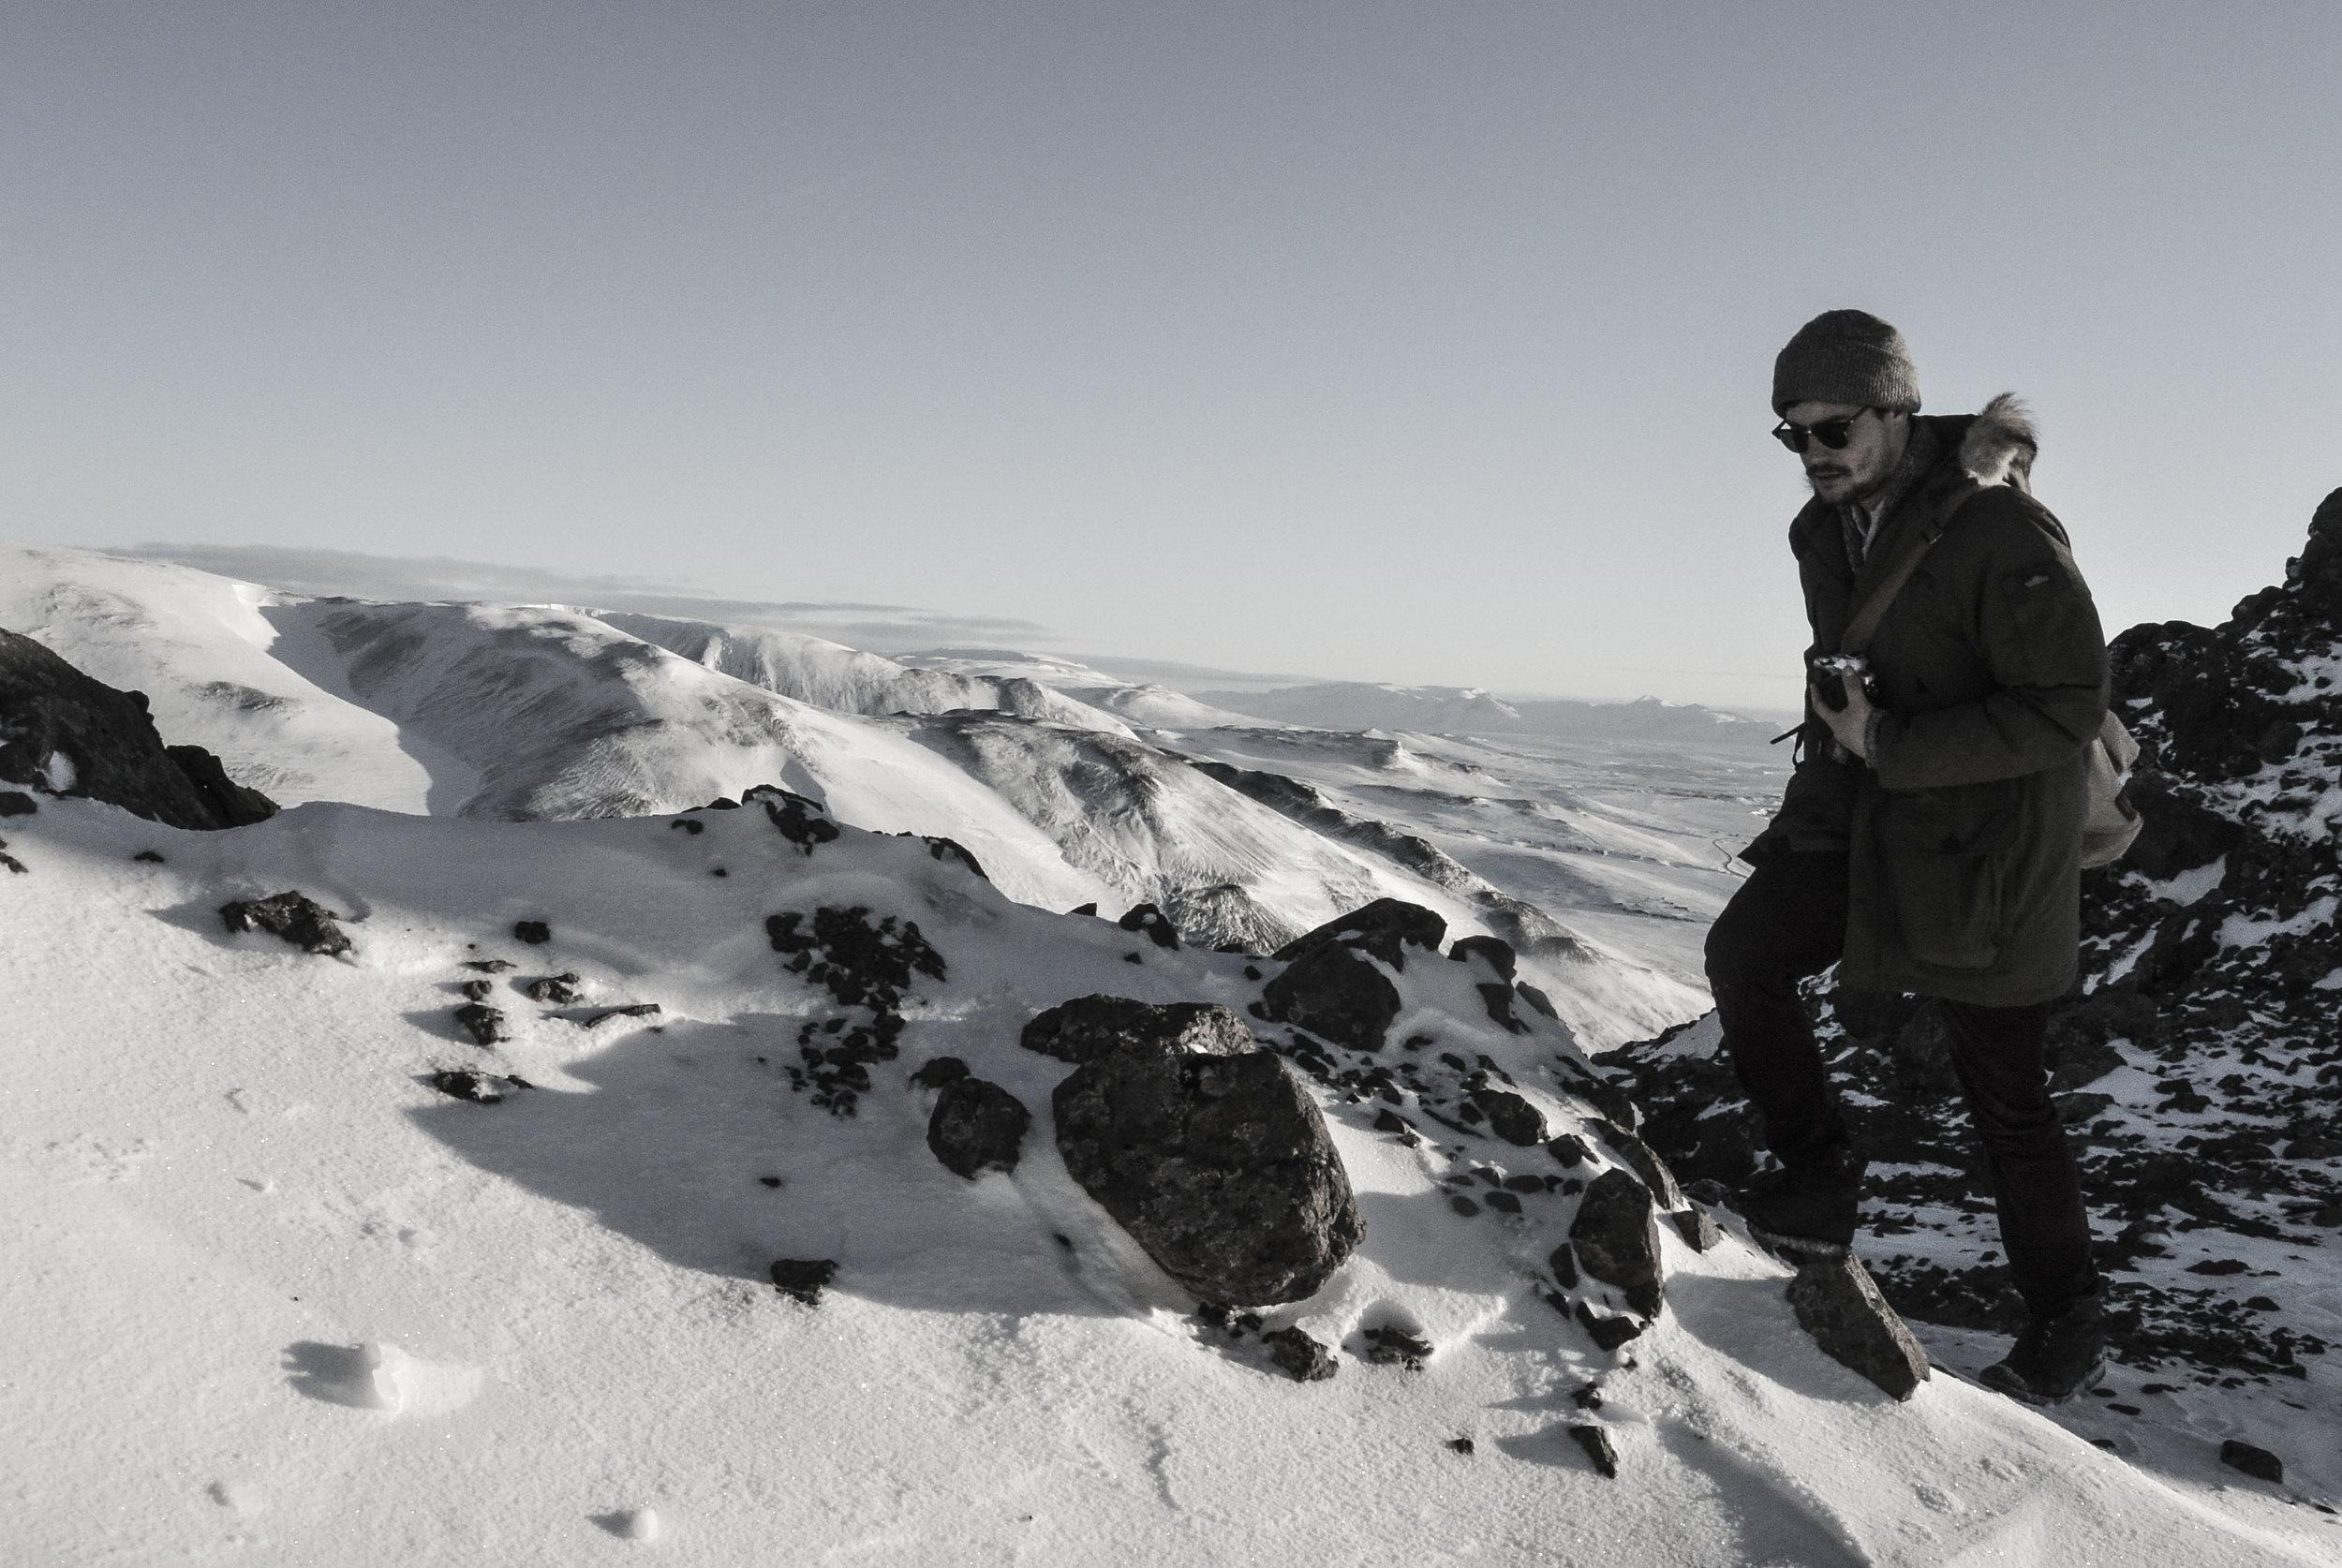 Cal Irvine hikes up Spákonufell in Skagaströnd, Iceland in March, 2016. (Megan Perra)